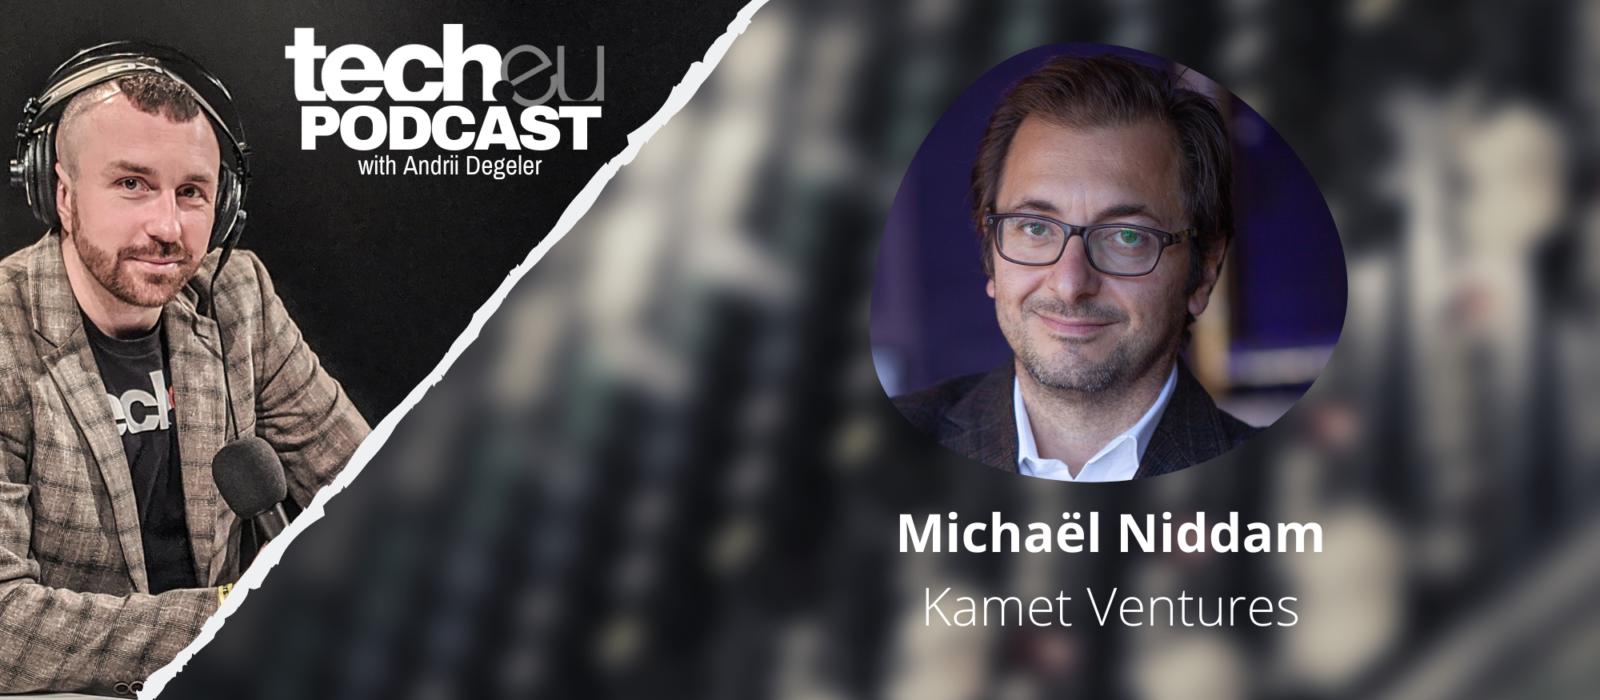 Tech.eu Podcast: Venture builder as a marketplace of ideas, with Michaël Niddam of Kamet Ventures